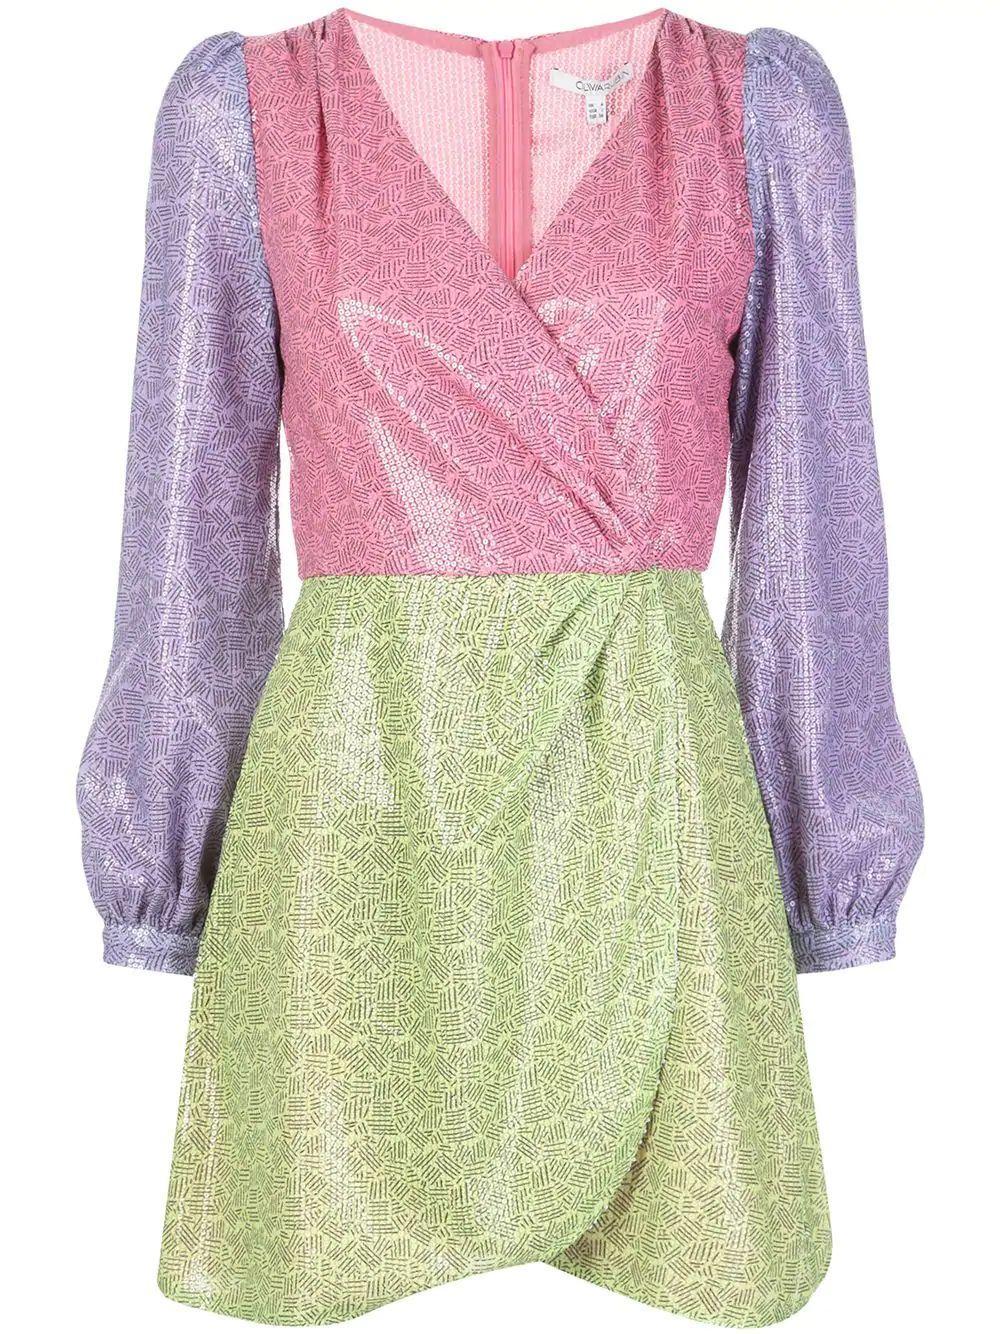 Meg Mix Print Faux Wrap Mini Dress Item # OR0266